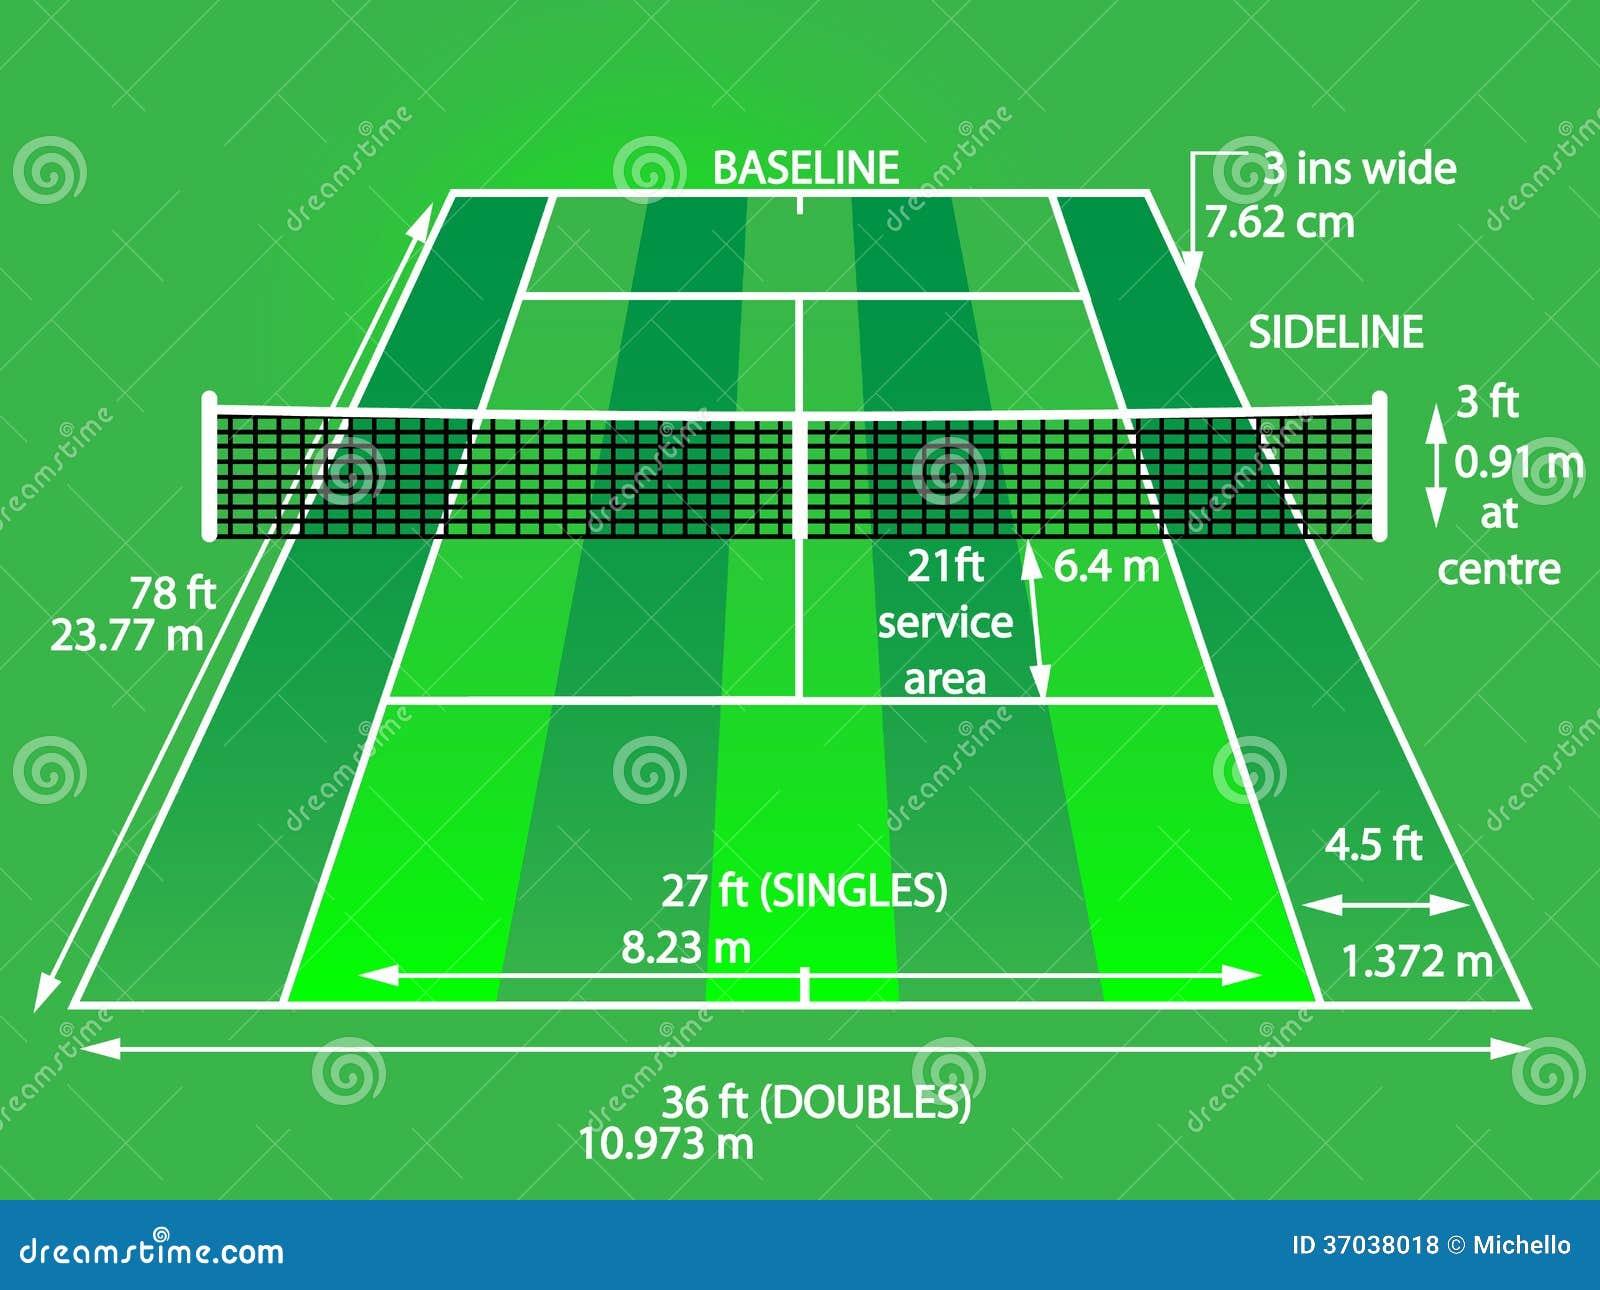 triyae com u003d tennis court backyard dimensions various design